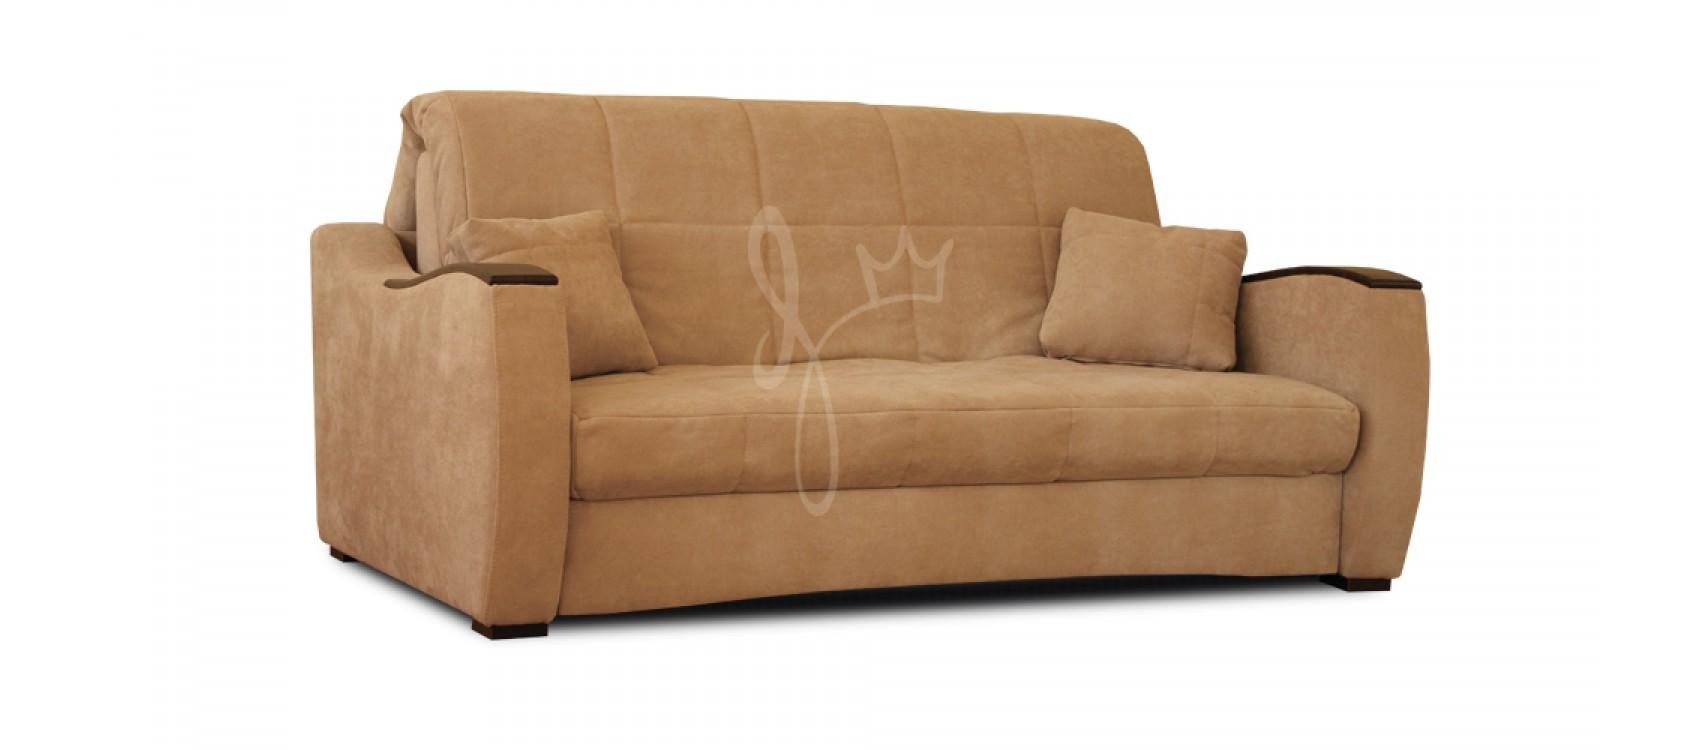 Sofa HAVANA foto 2